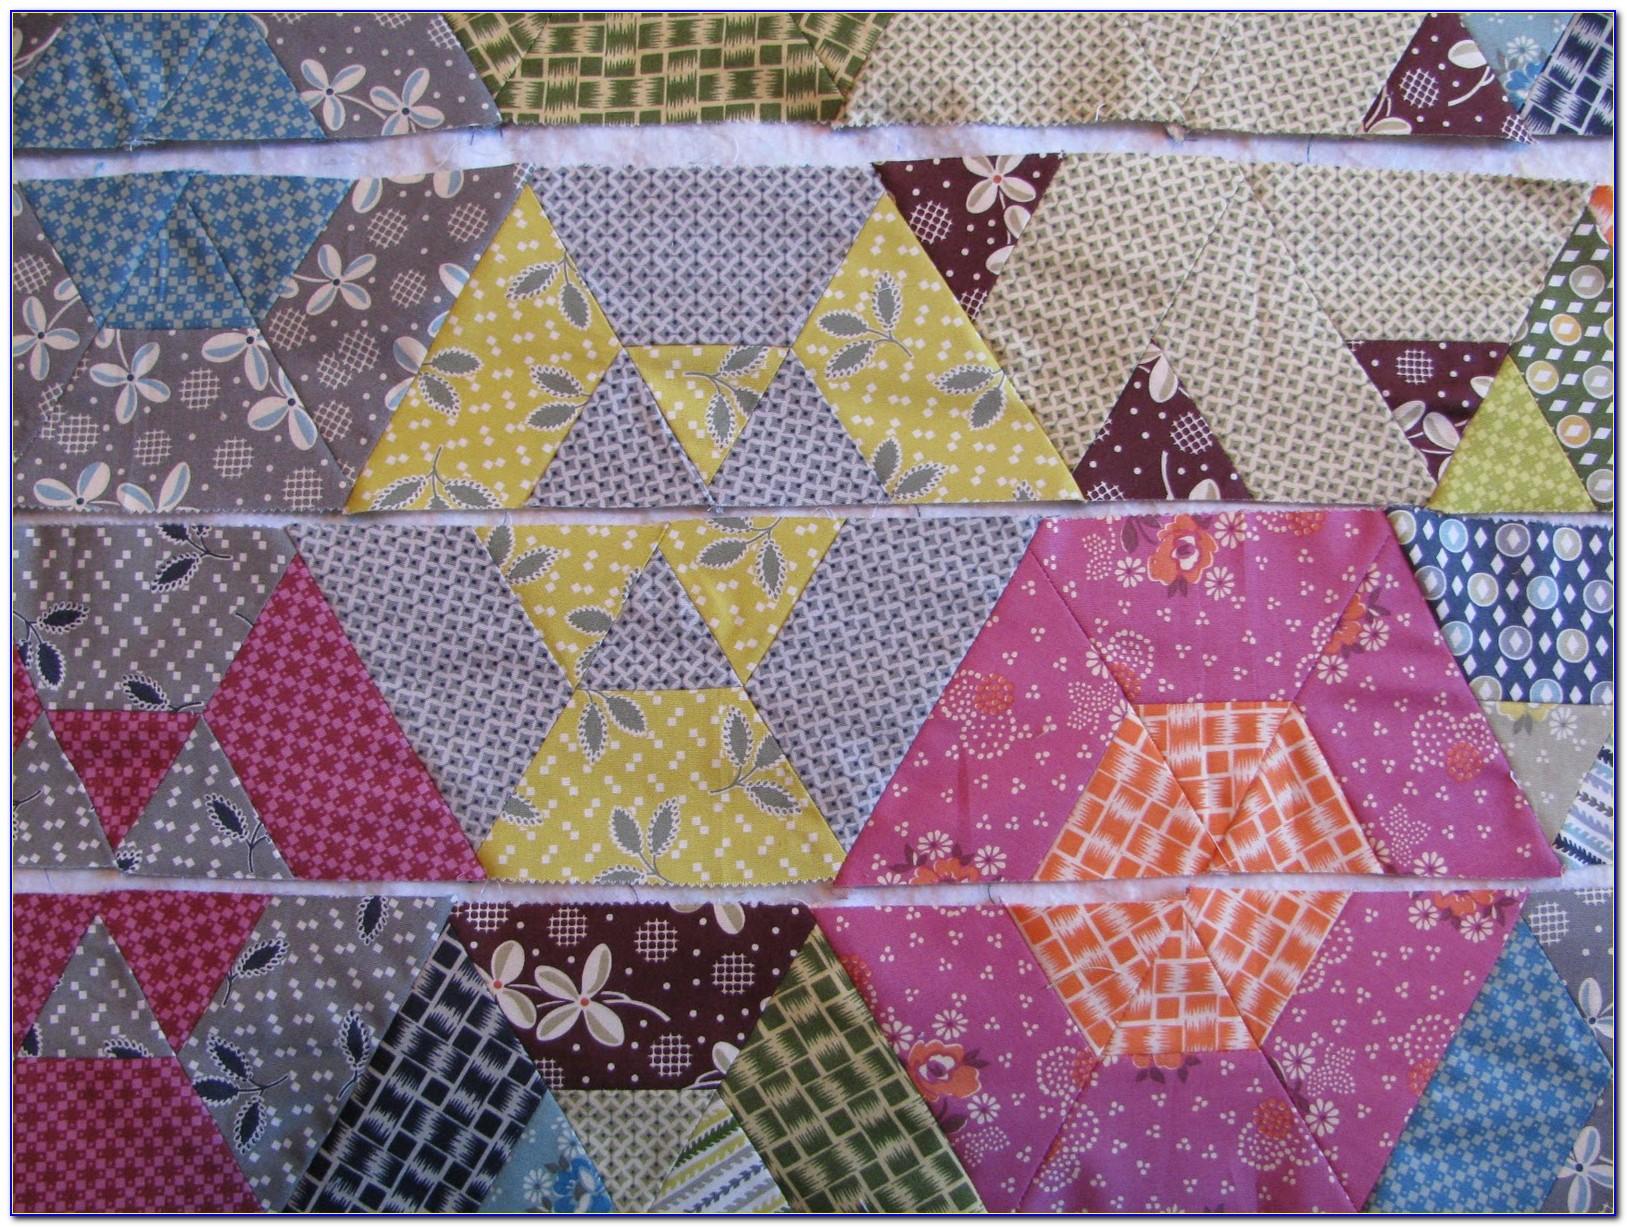 I Spy Hexagon Quilt Patterns Free